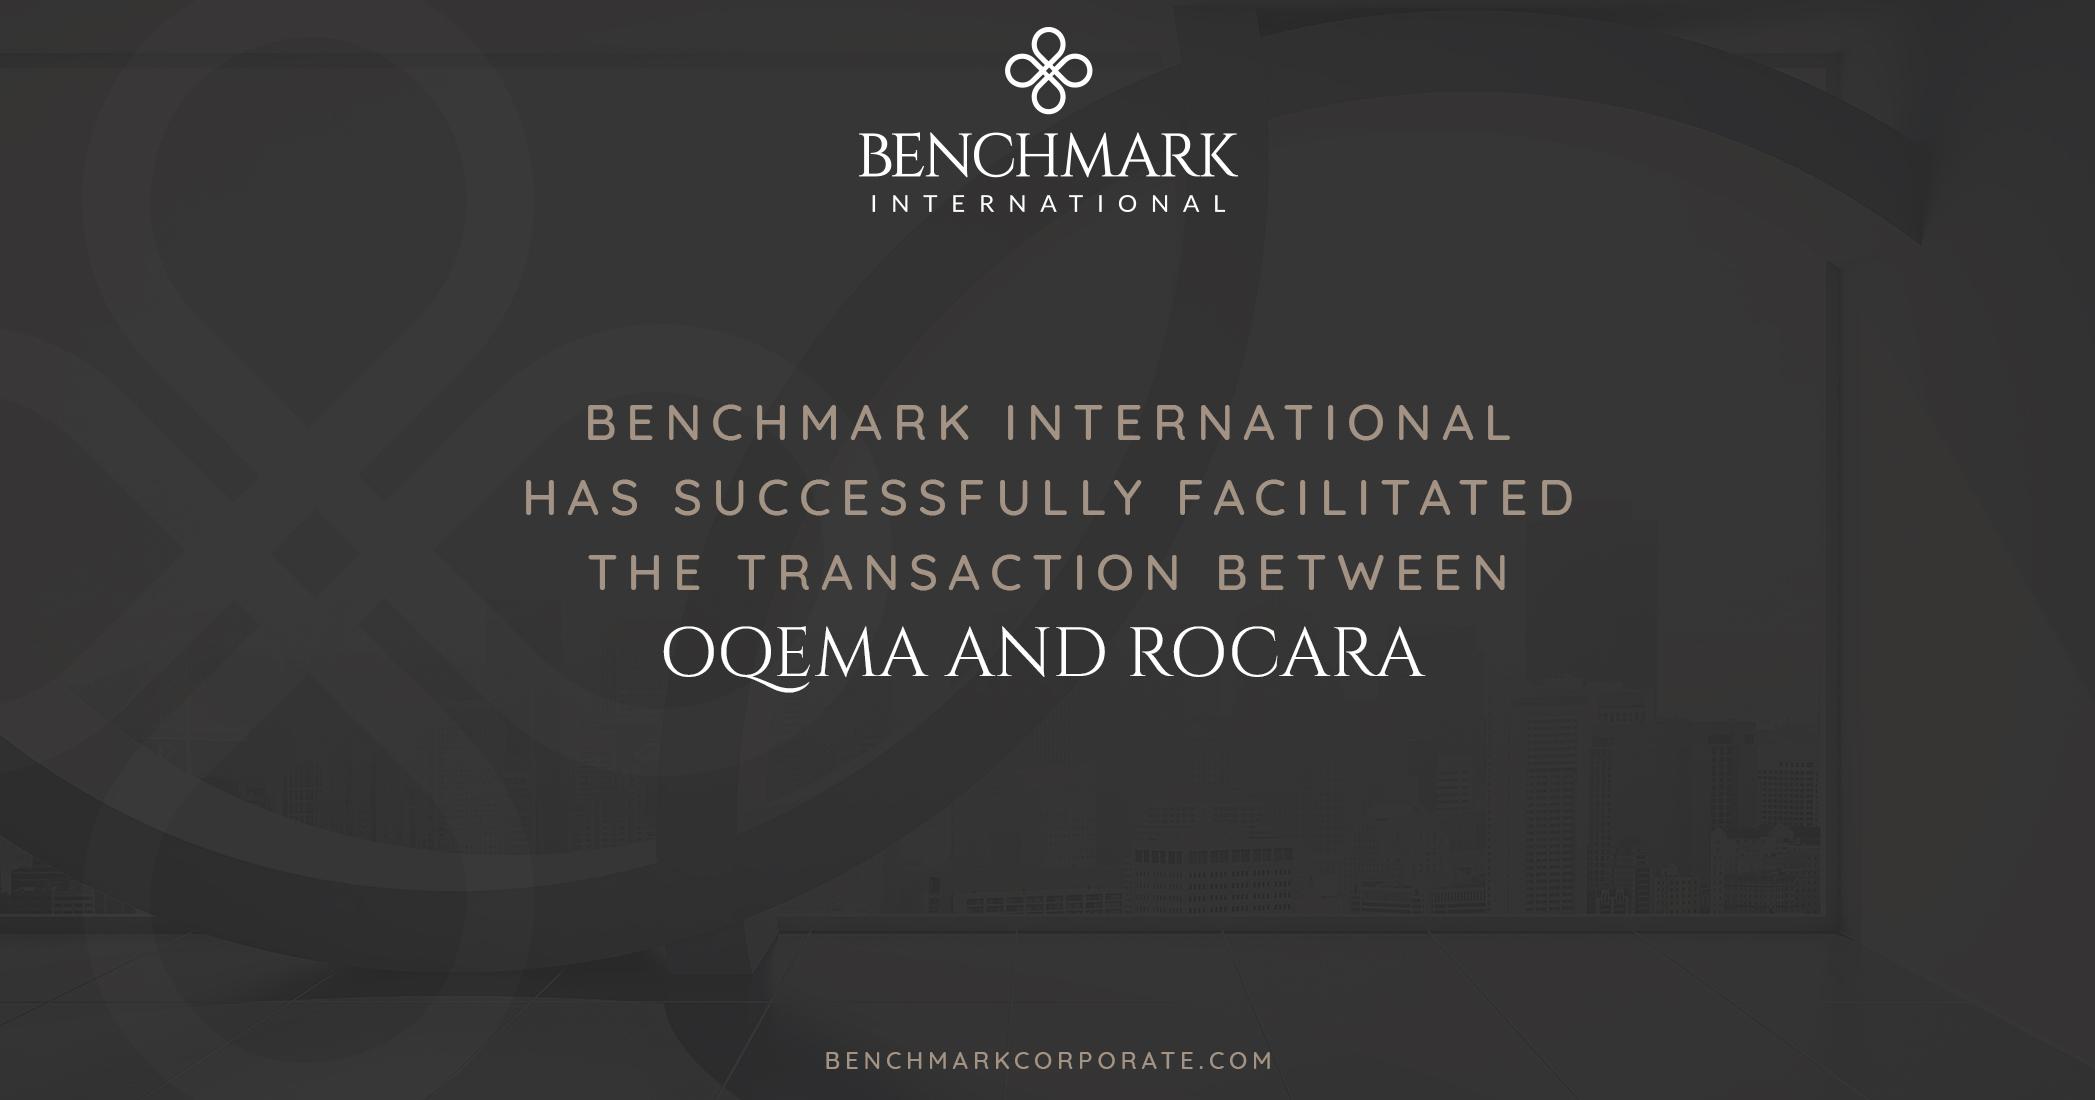 Benchmark International Has Successfully Facilitated the transaction between OQEMA and Rocara